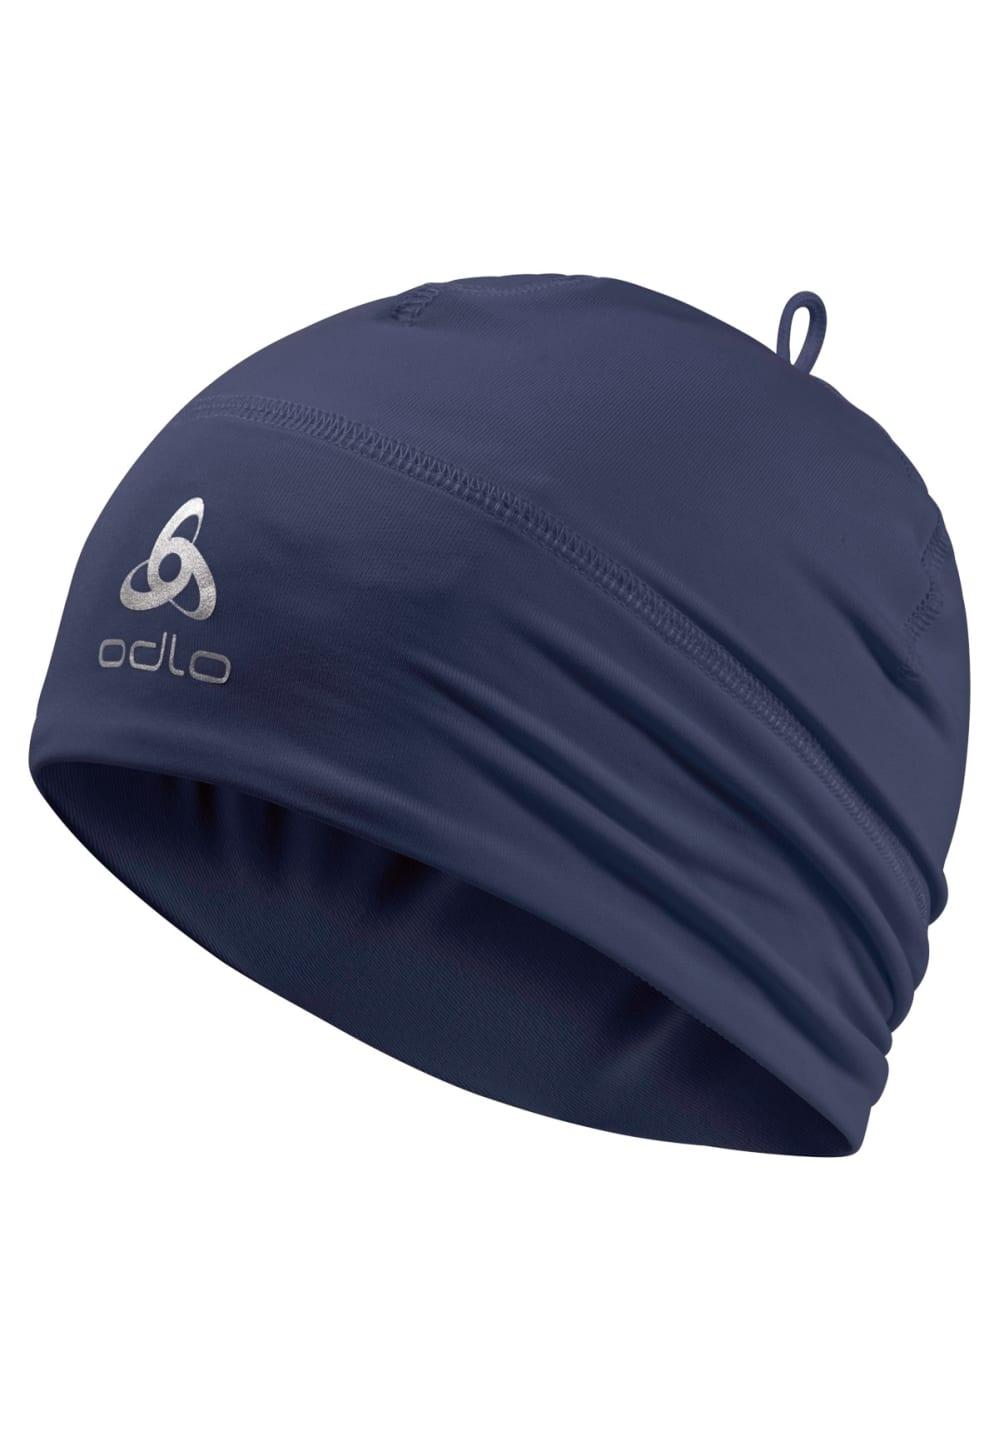 Odlo Hat Polyknit Kopfbedeckung - Blau